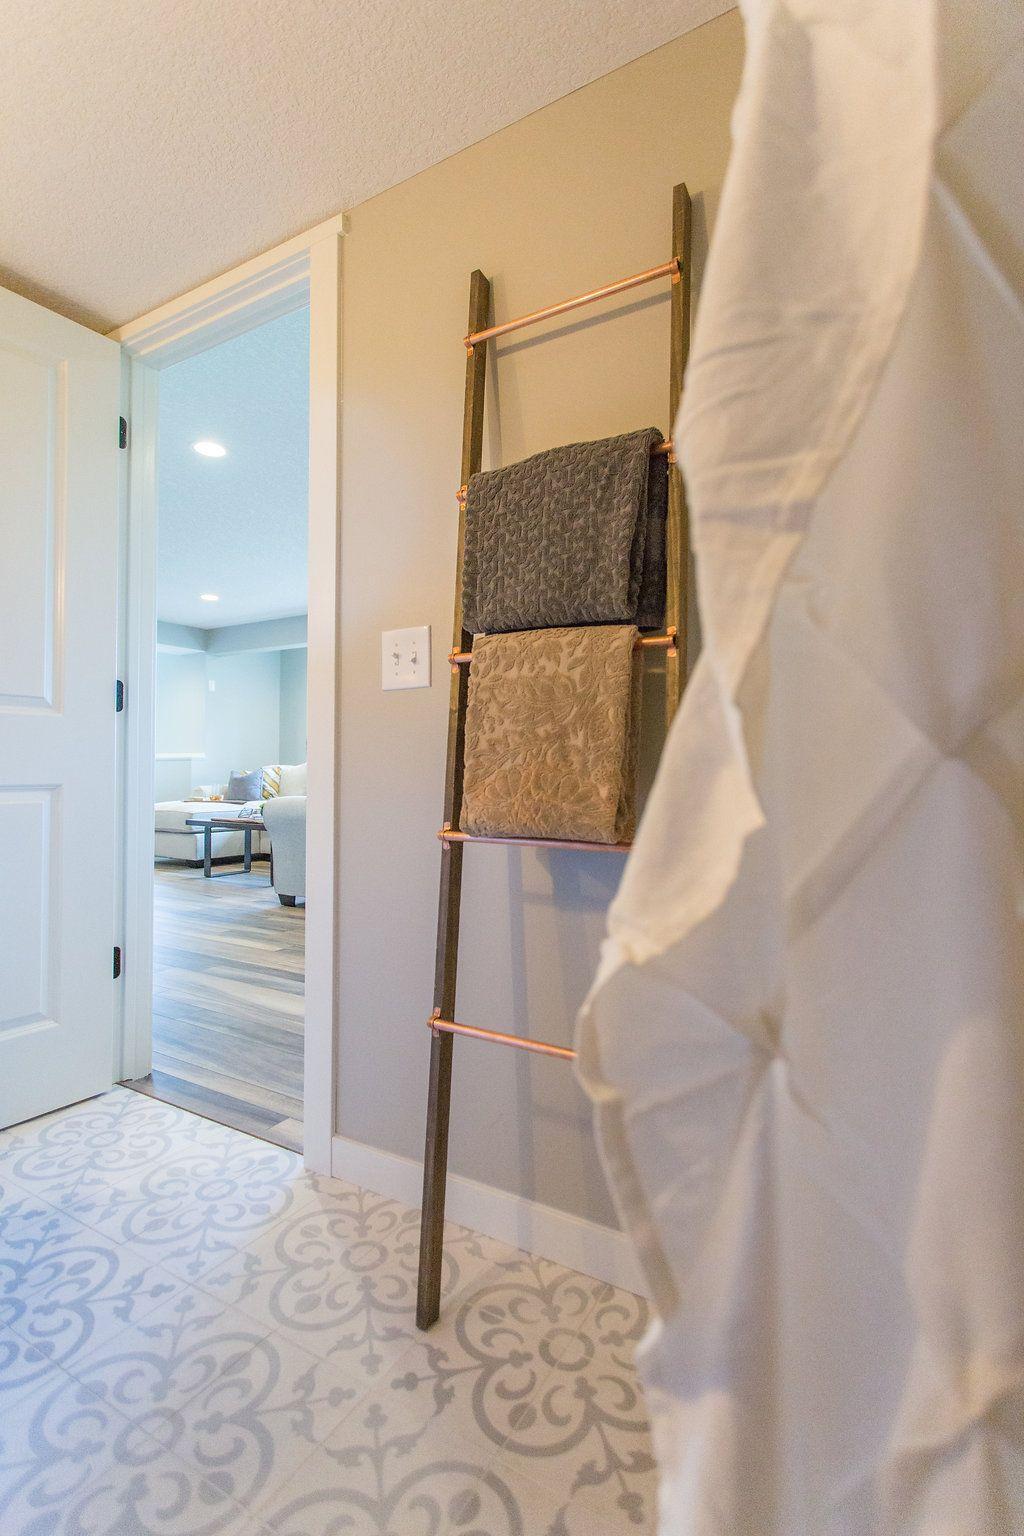 Bathroom Towel Racks Home Depot